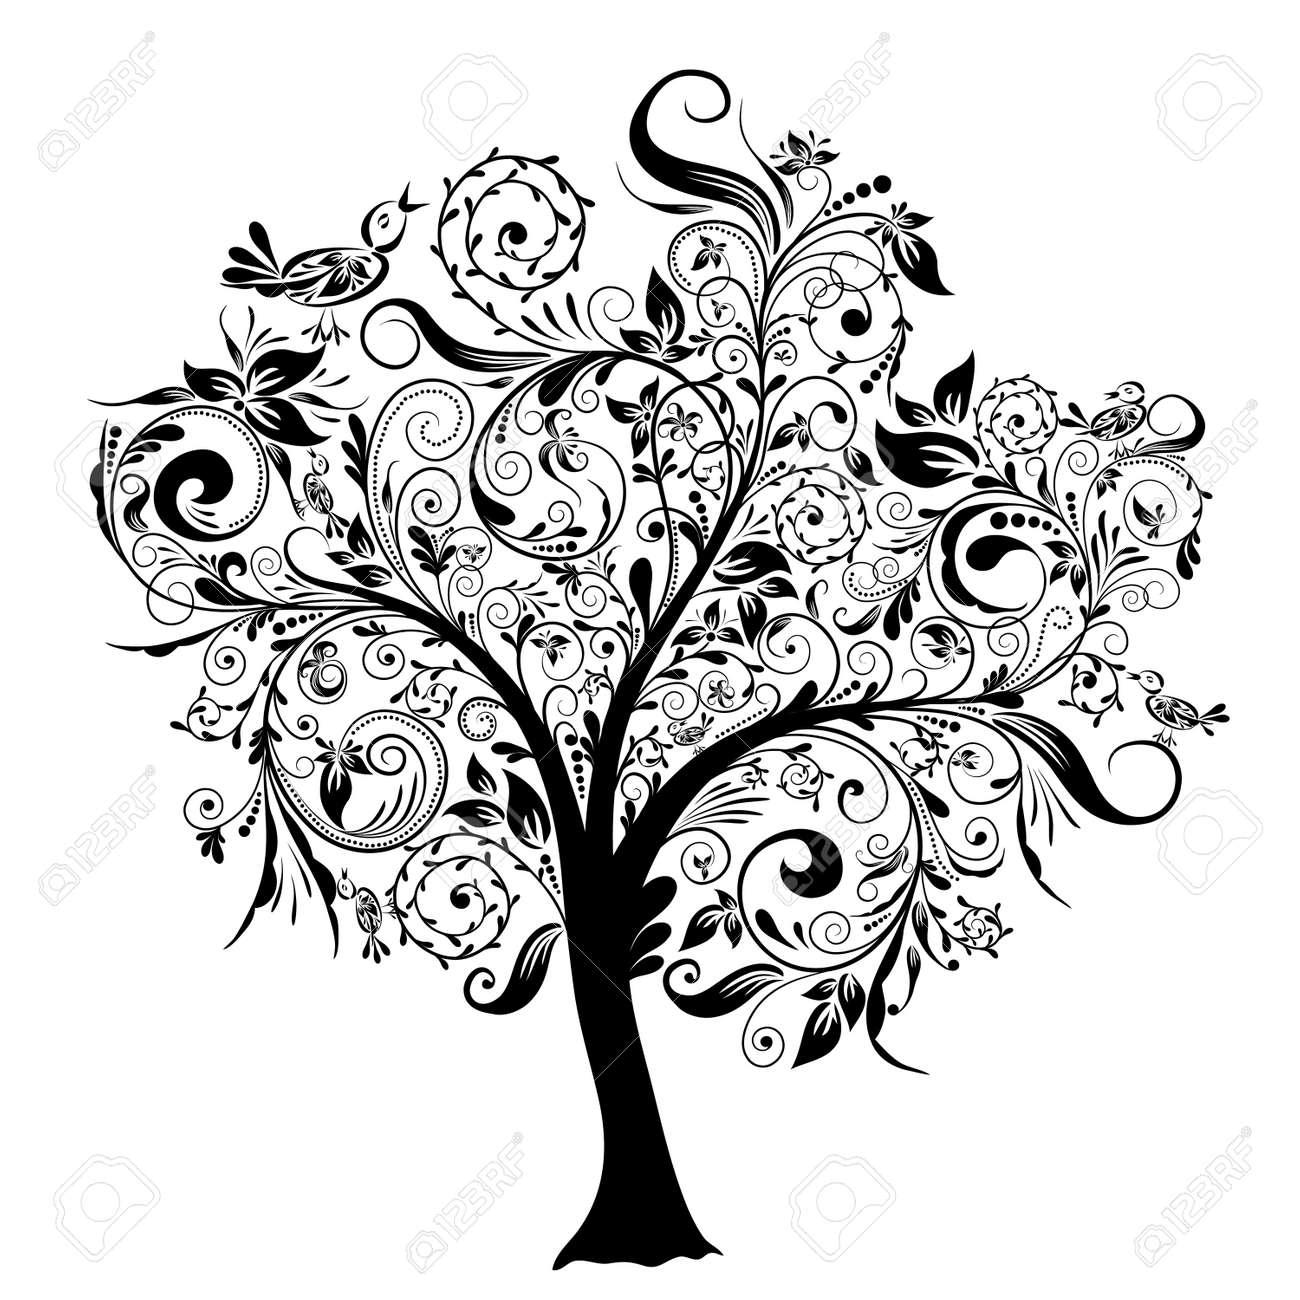 decorative royalty free tree hand of image bonsai vector decor illustration drawn stock symbol nature